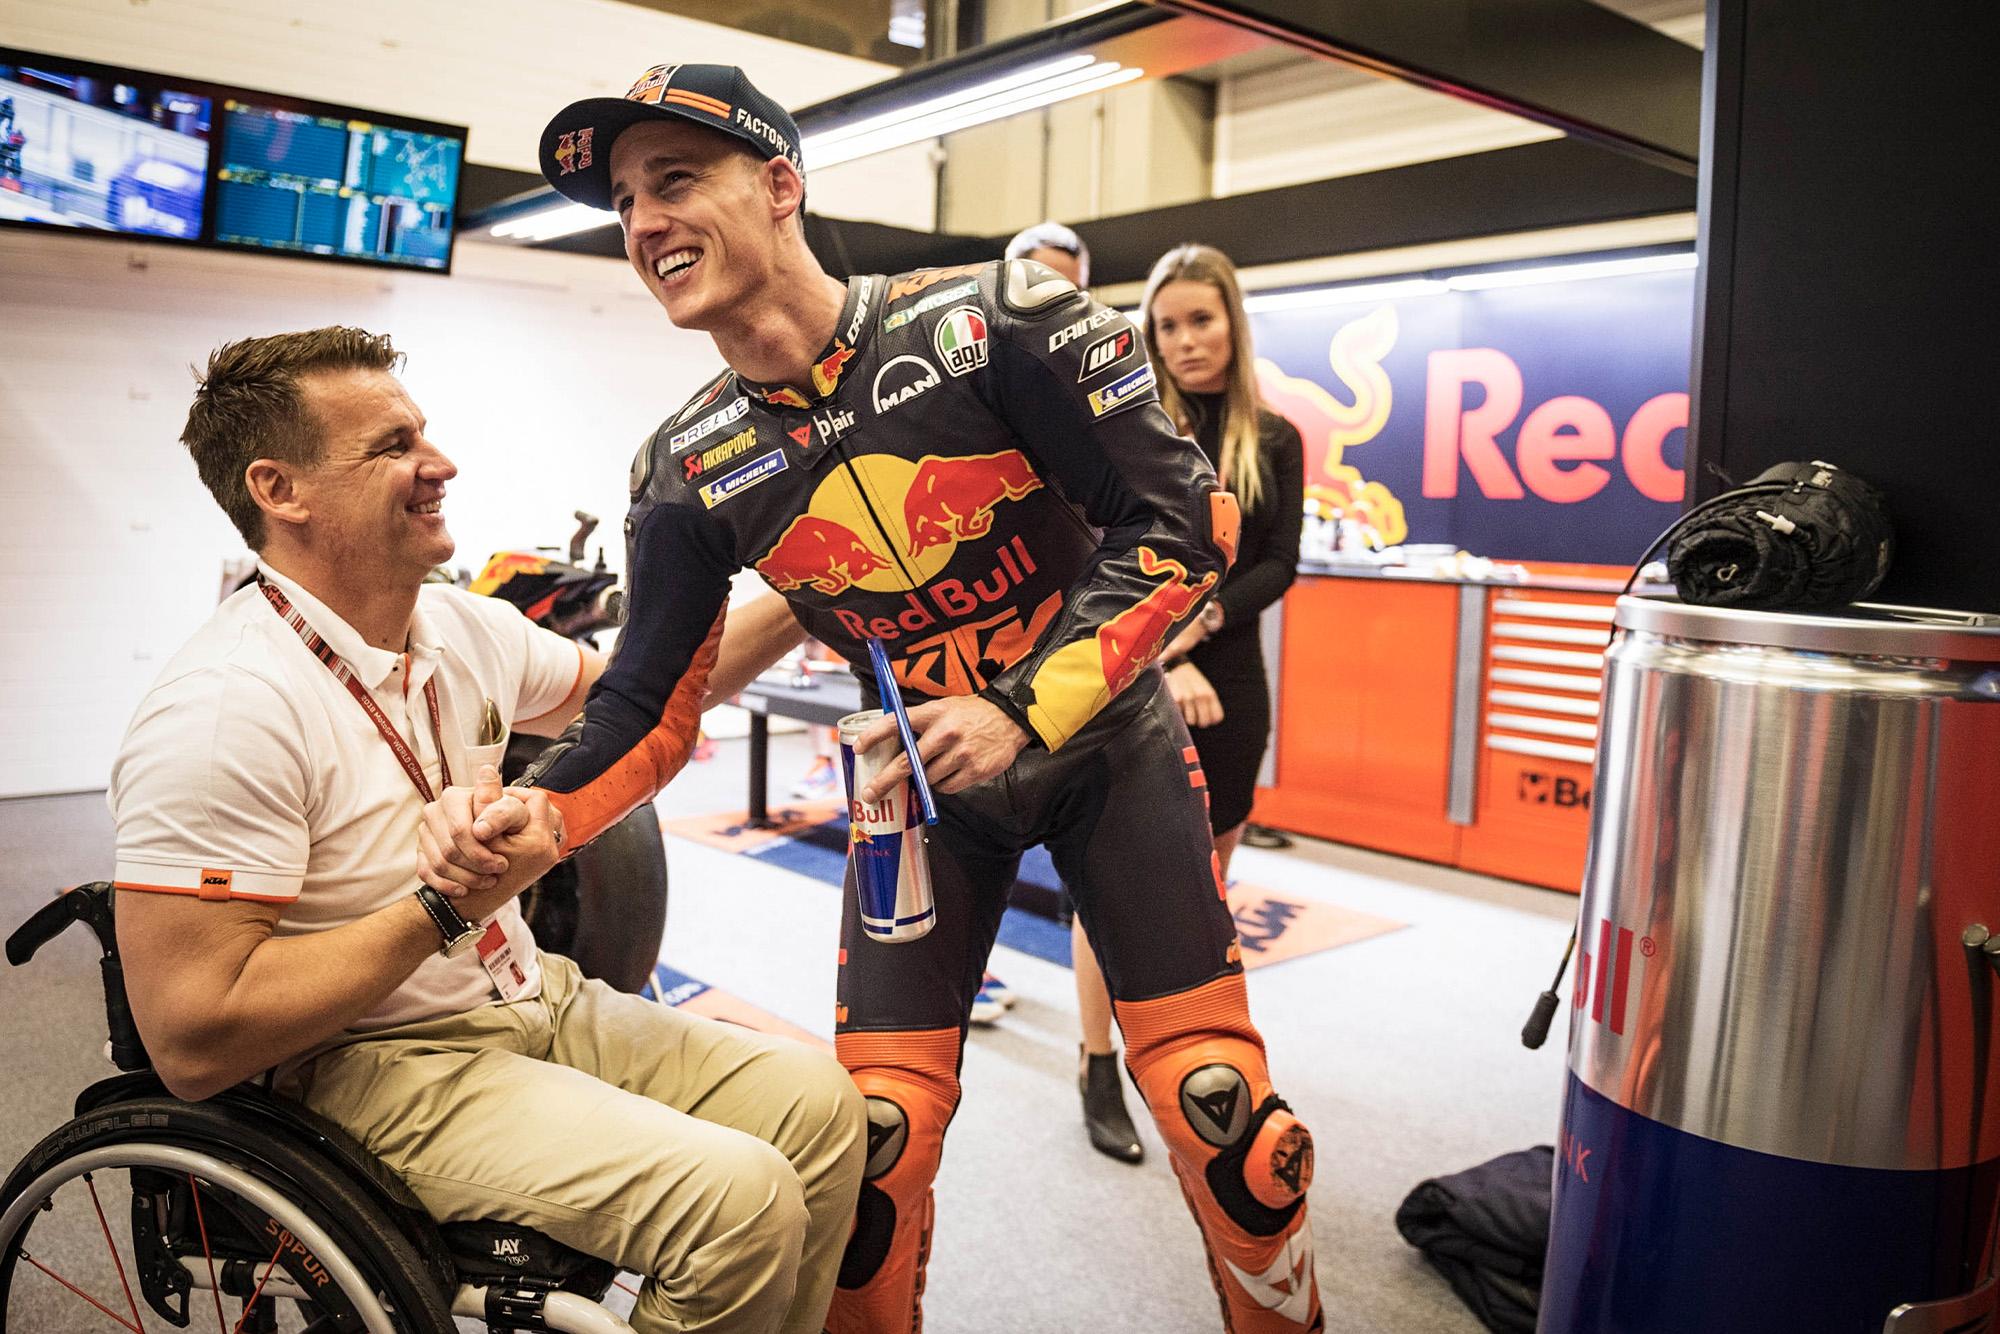 KTMs Pit Beirer with Pol Espargaro